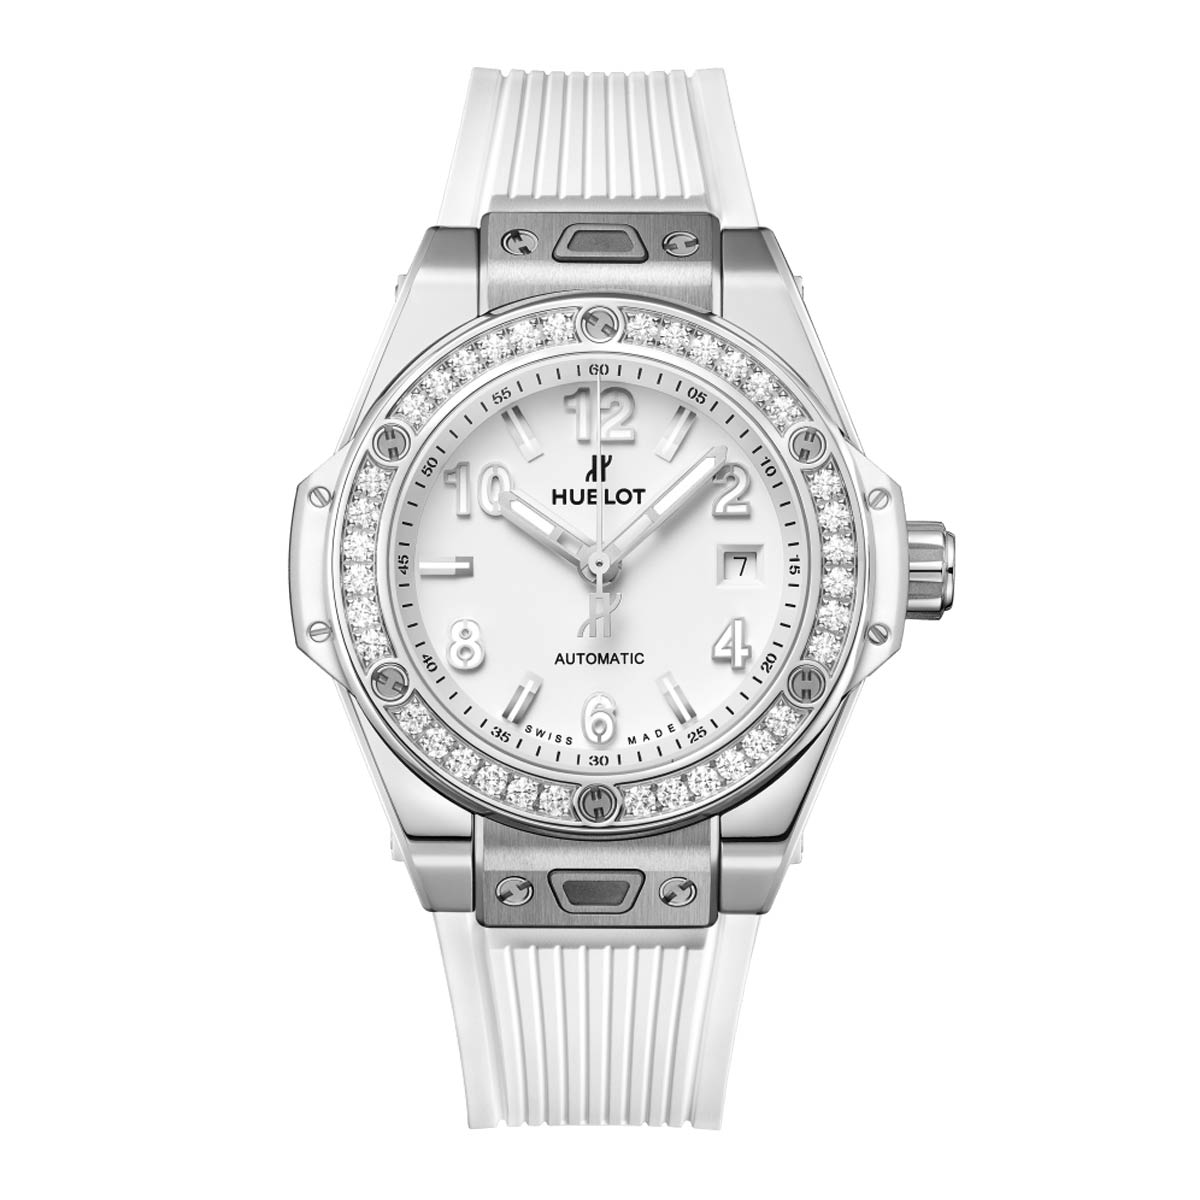 Steel White Diamonds, Ref 485.SE.2010.RW.1204